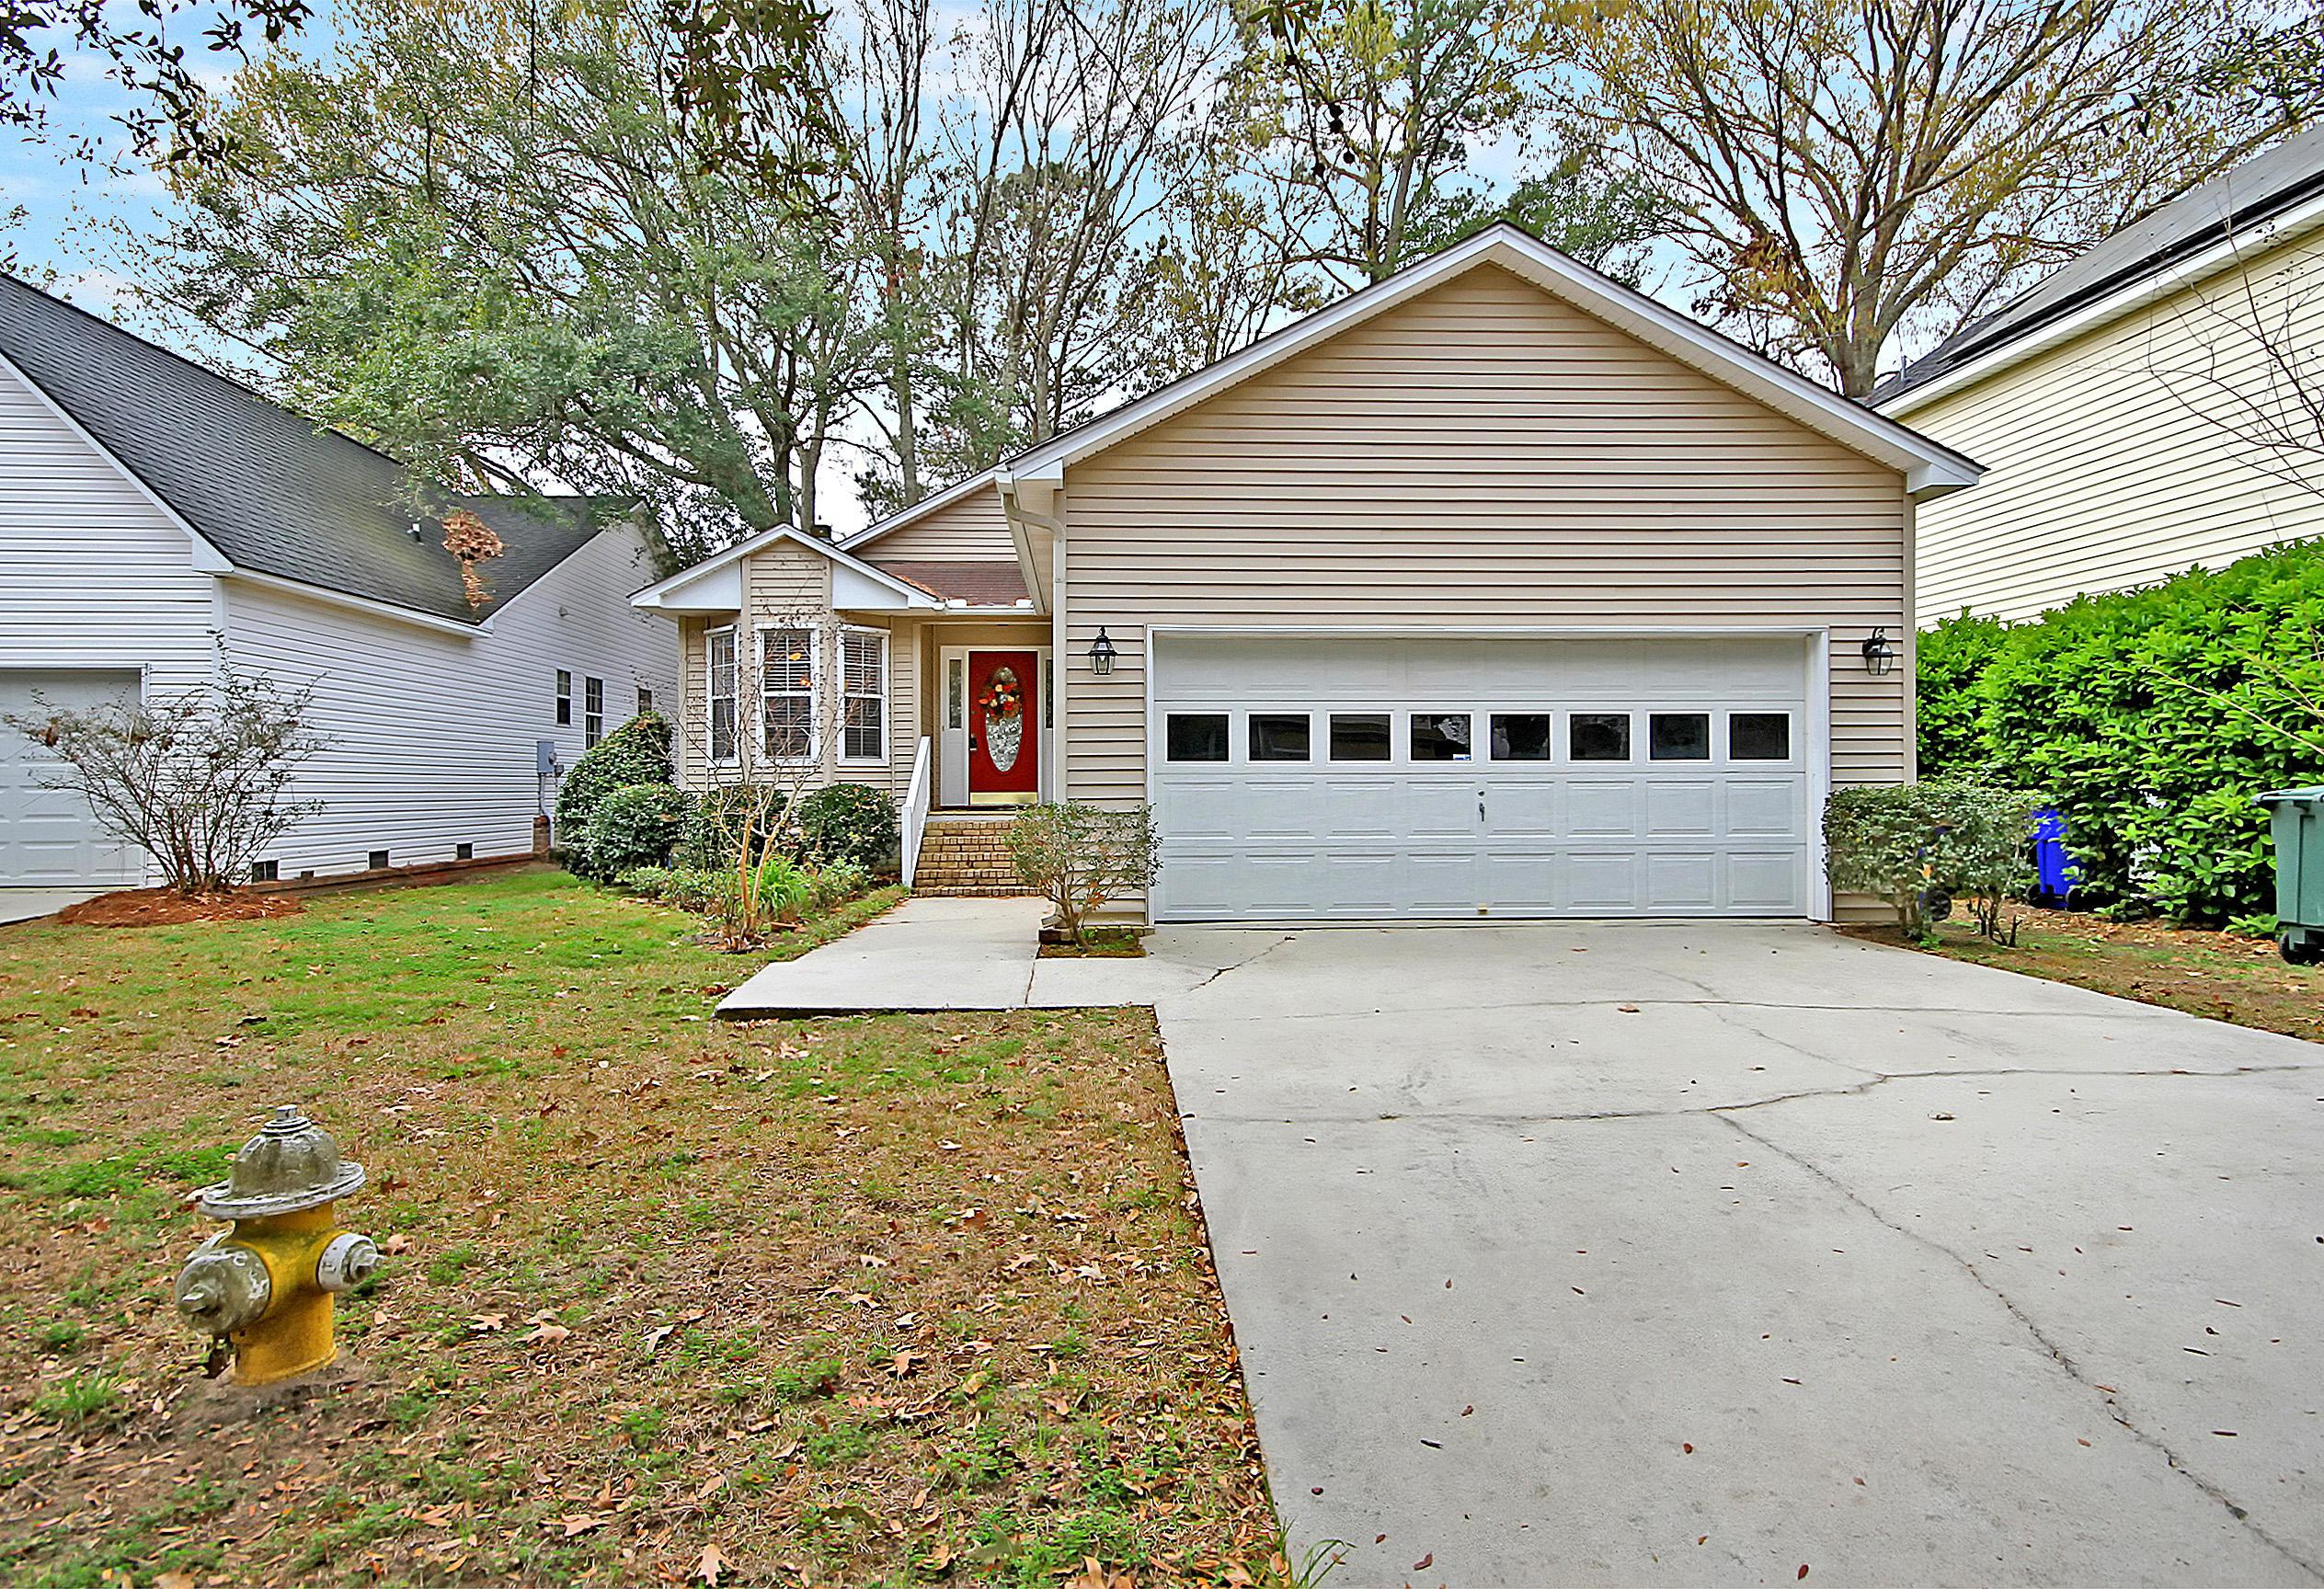 Harbor Place Homes For Sale - 845 Harbor Pl, Charleston, SC - 23